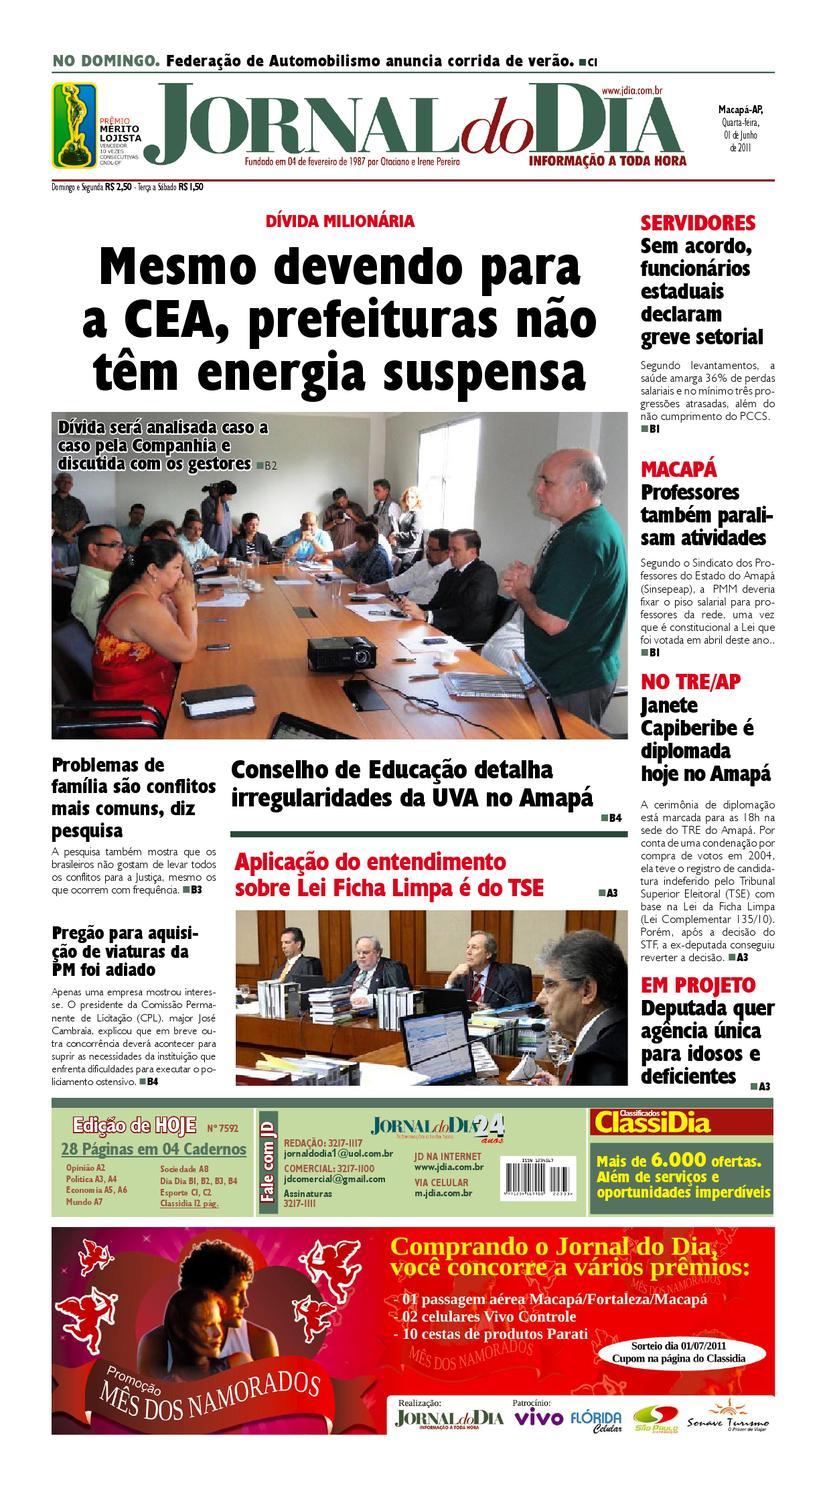 9de42a37b jdia 01 06 2011 by Jornal Do Dia - issuu